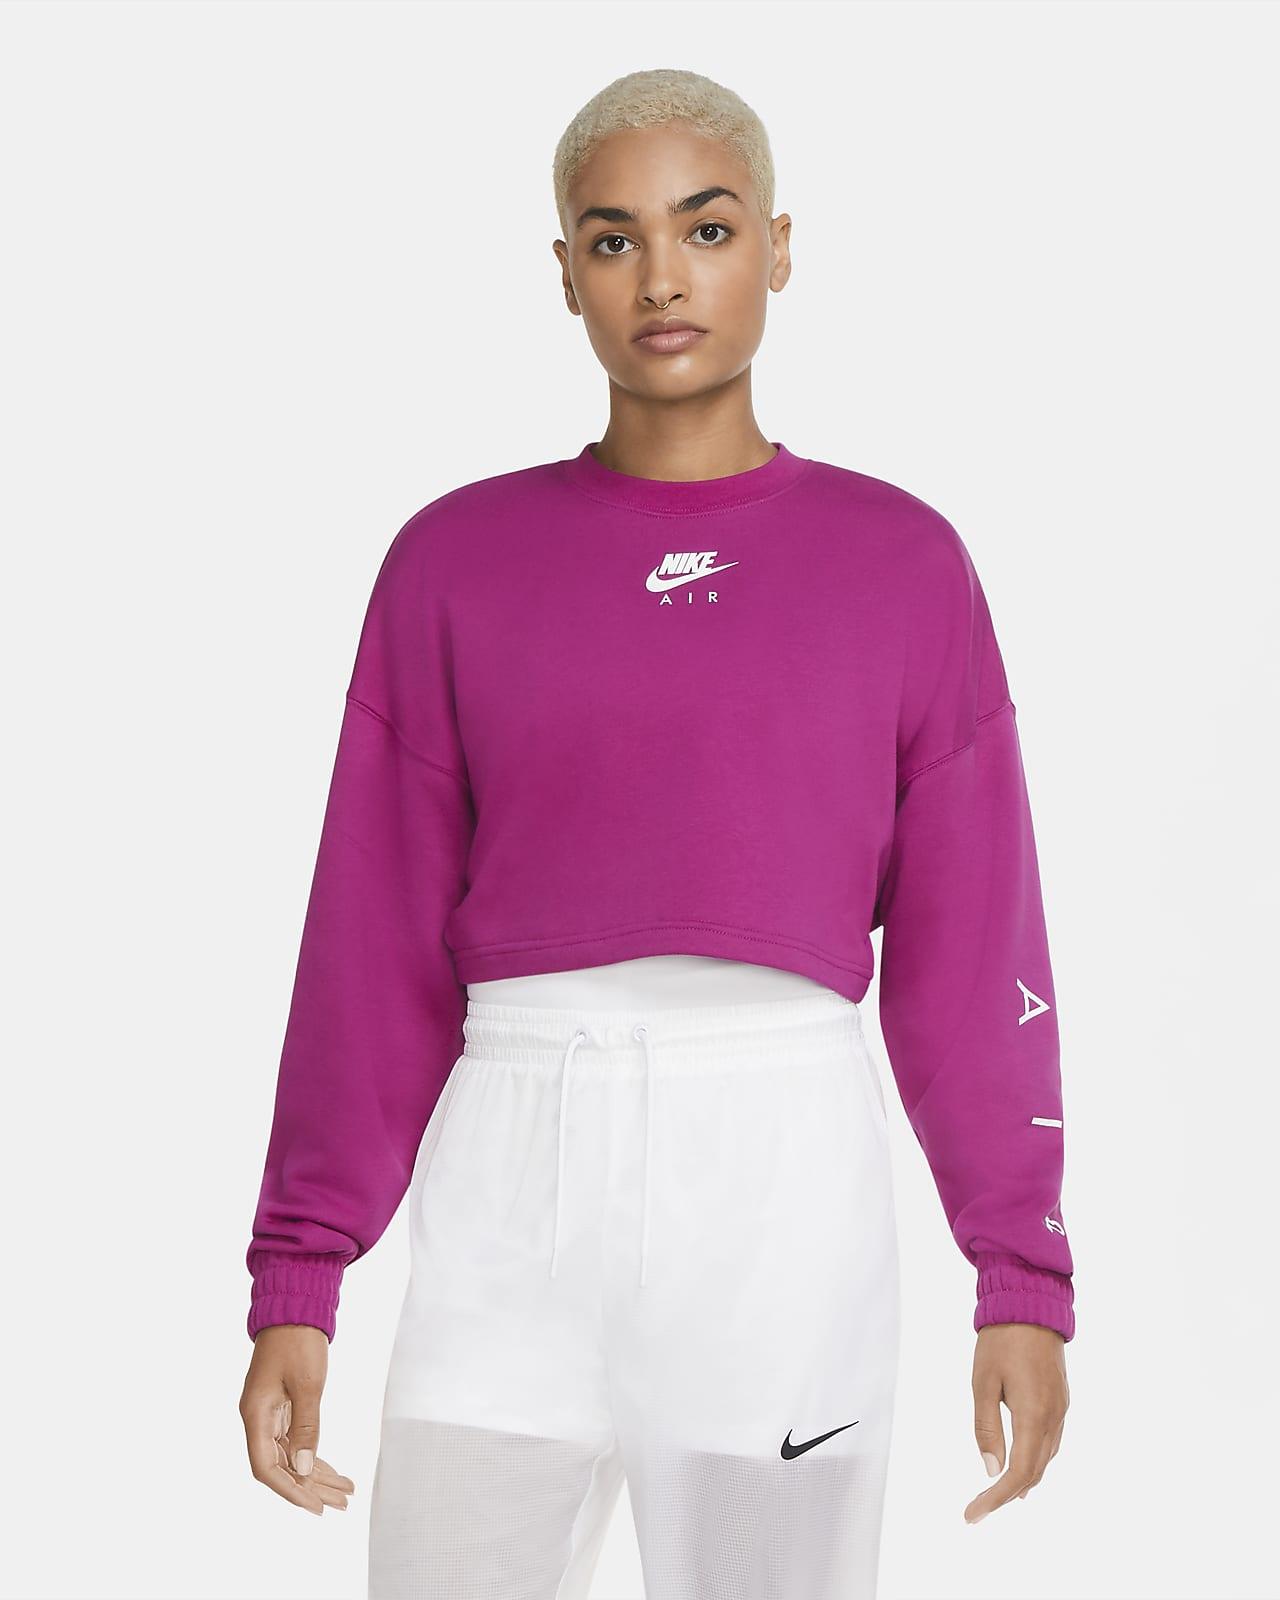 Nike Air Women's Cropped Fleece Crew